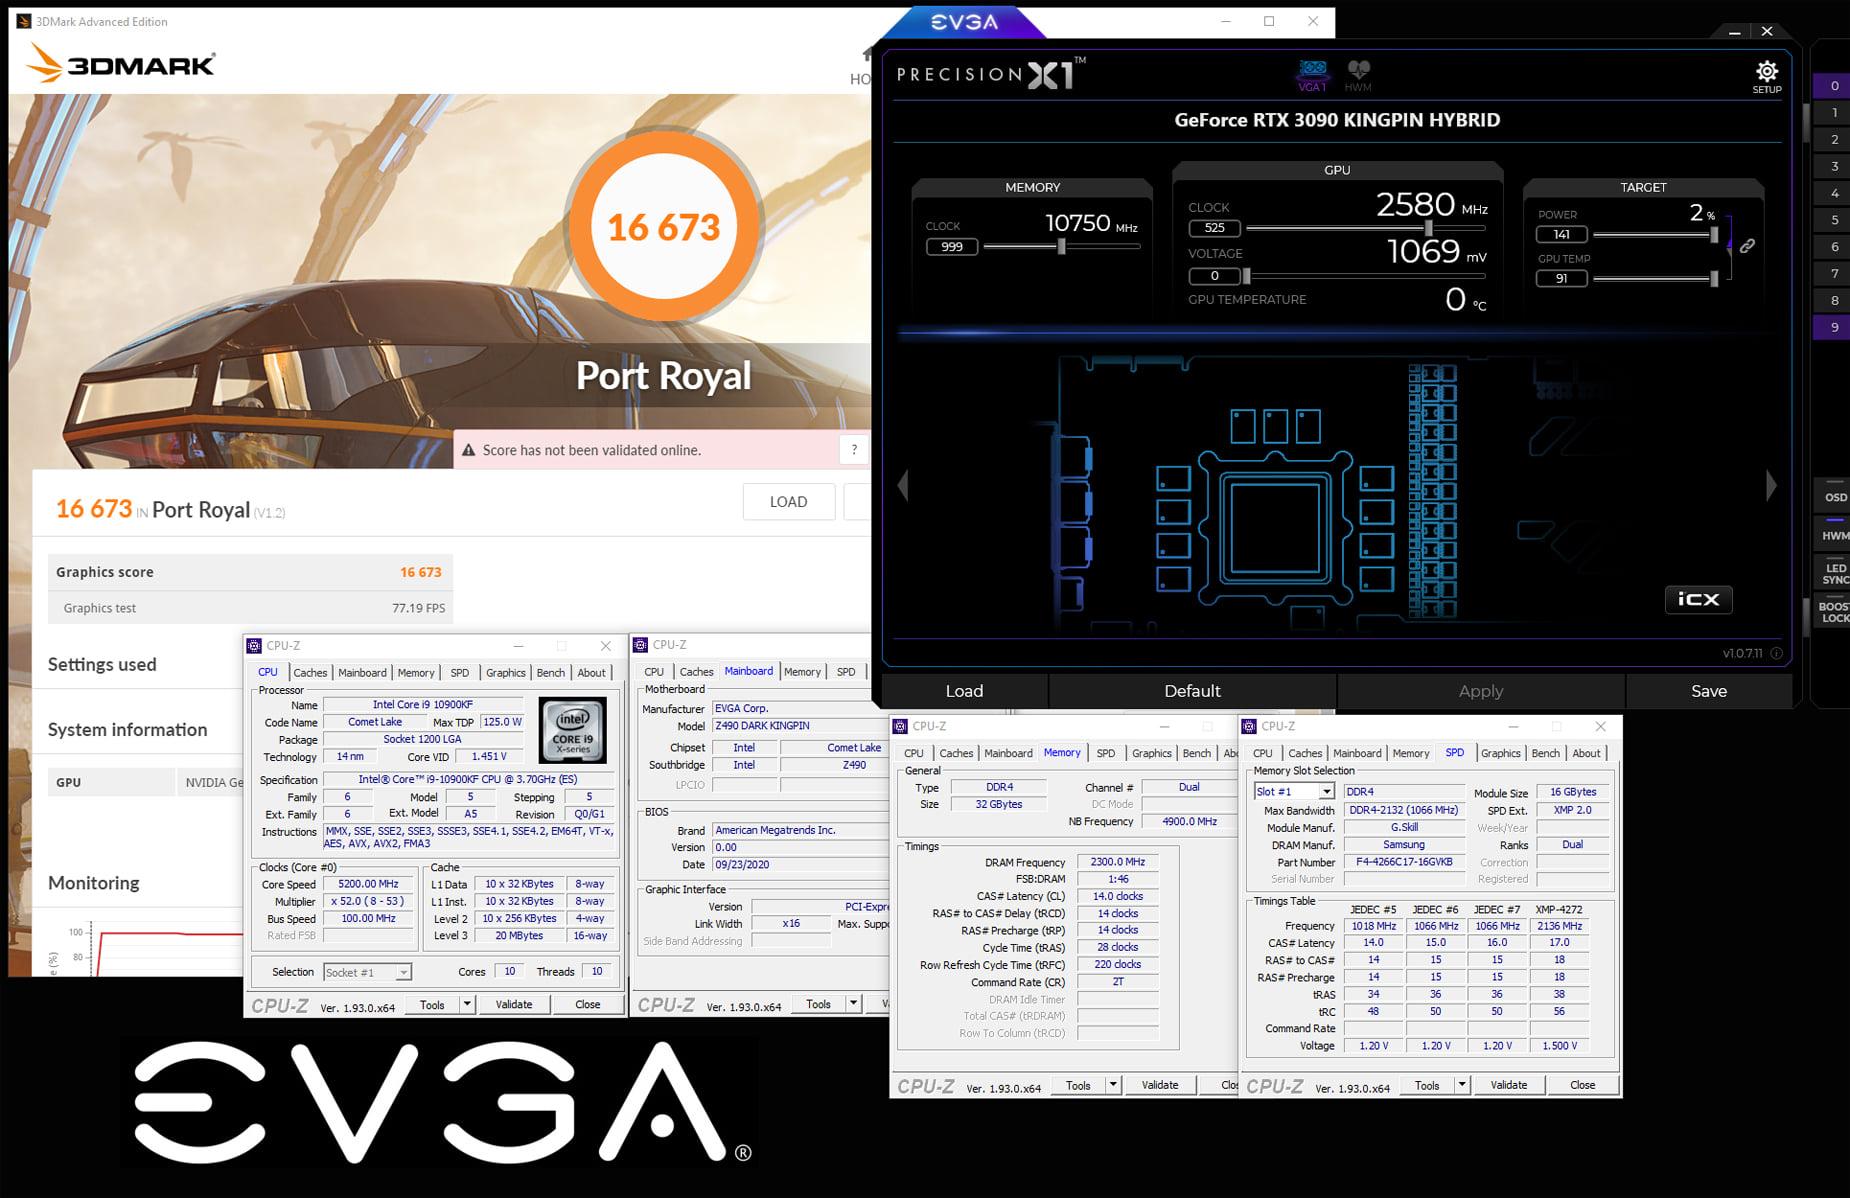 Media asset in full size related to 3dfxzone.it news item entitled as follows: La EVGA GeForce RTX 3090 KINGPIN supera i 2.5GHz con azoto liquido   Image Name: news31154_EVGA-GeForce-RTX-3090-KINGPIN_2.jpg